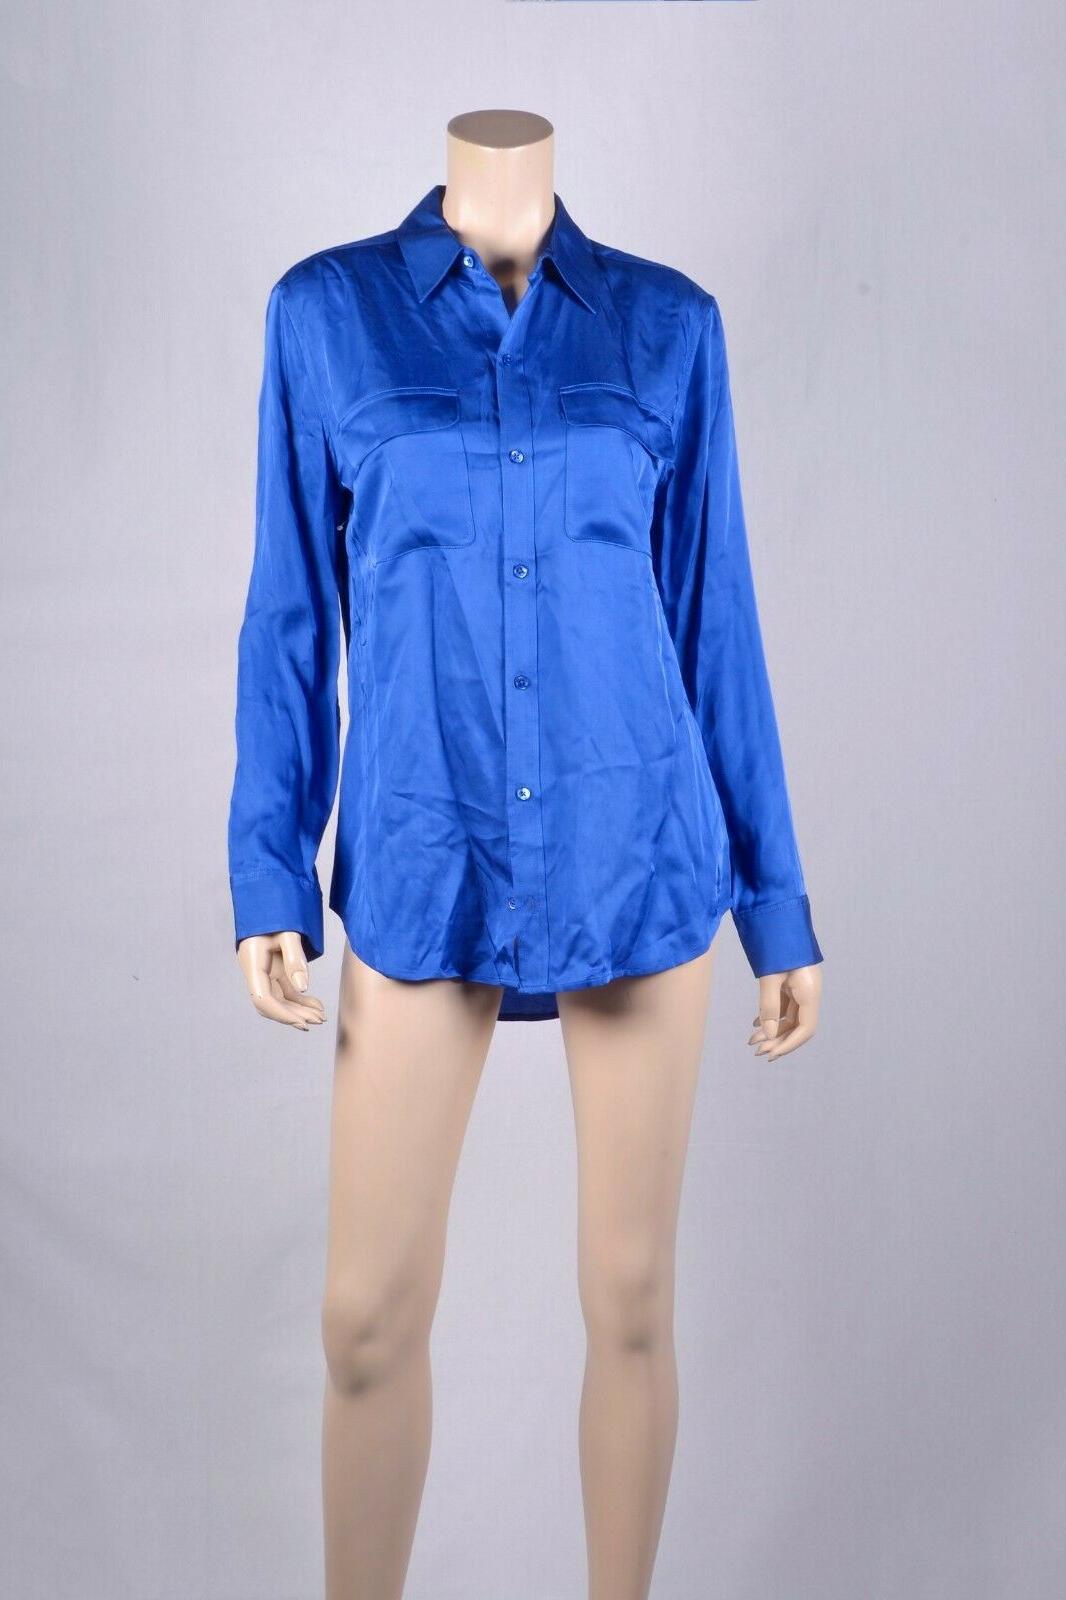 NWOT Blue Shirt S